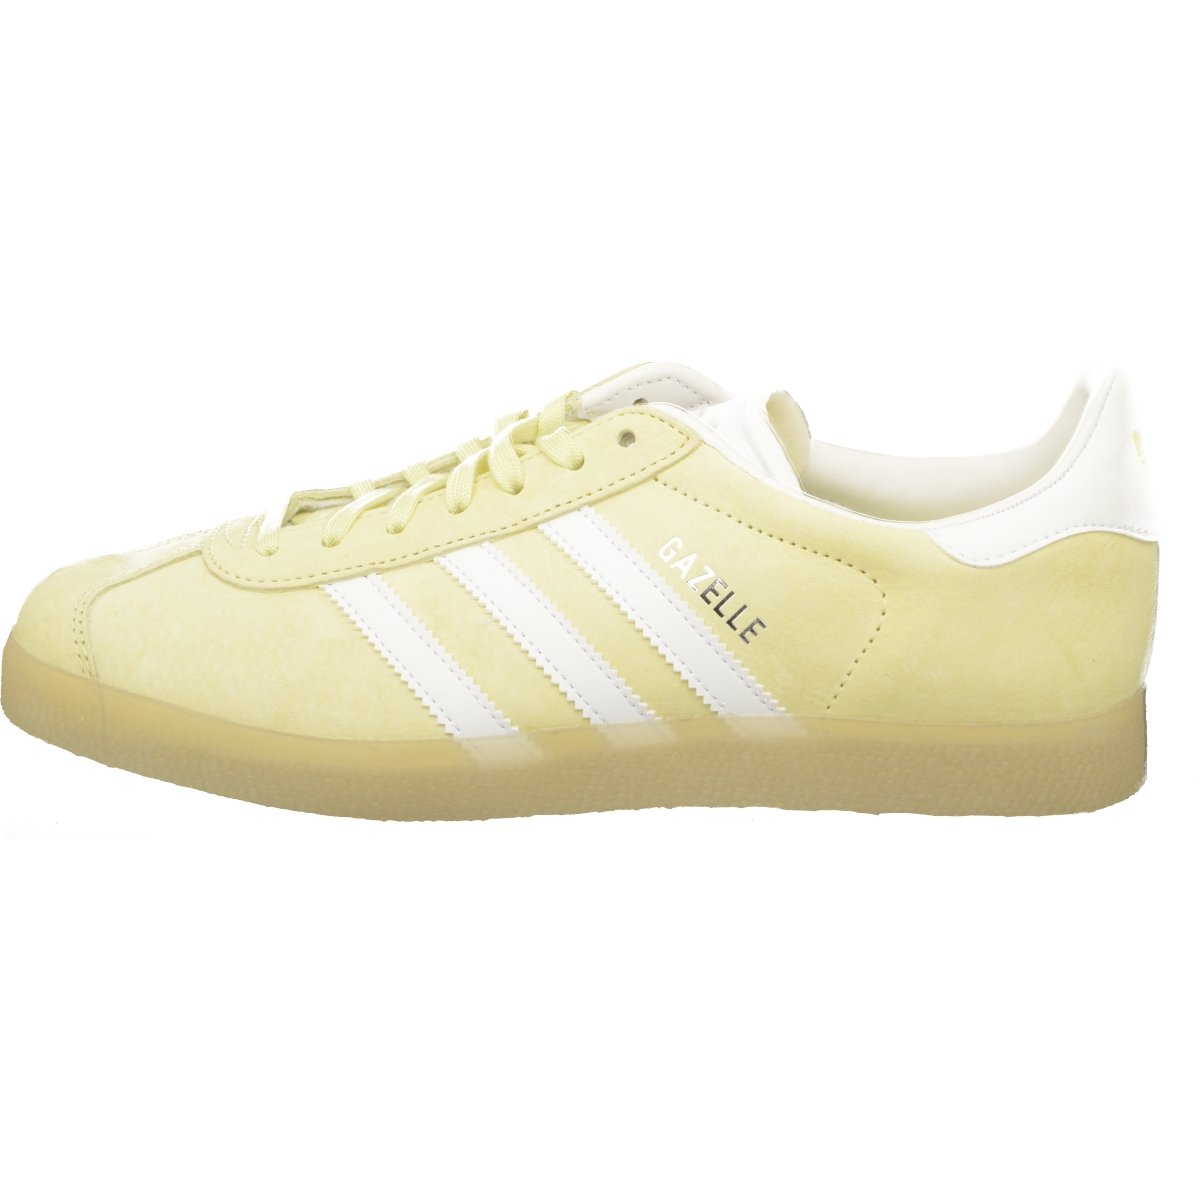 Adidas Adidas Adidas - Gazelle, Scarpe da Ginnastica Unisex Adulto | Prezzi Ridotti  | Gentiluomo/Signora Scarpa  76fddf